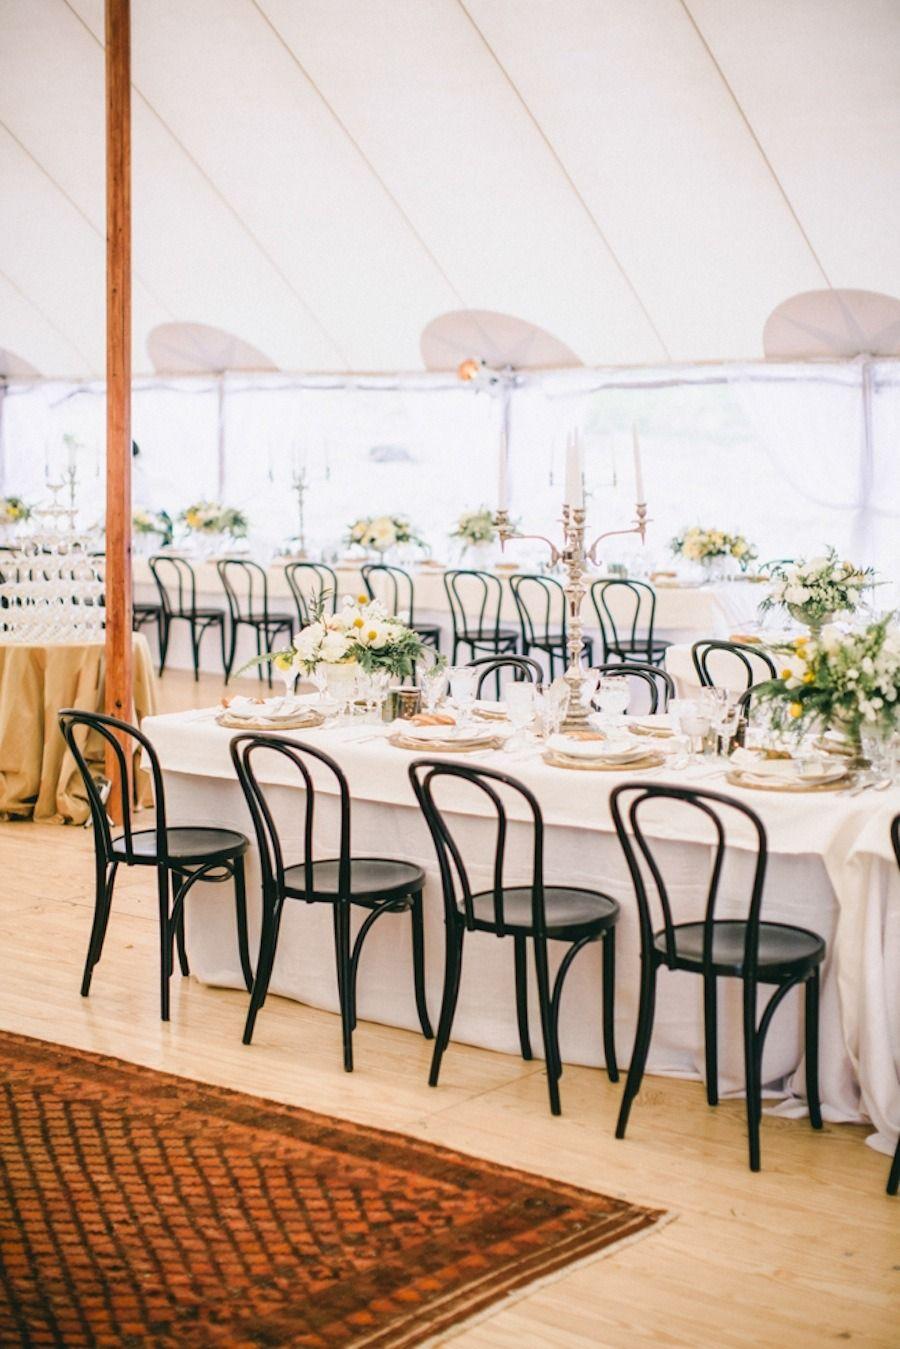 1920s Inspired Healdsburg Wedding | Tent wedding, Tents and Reception